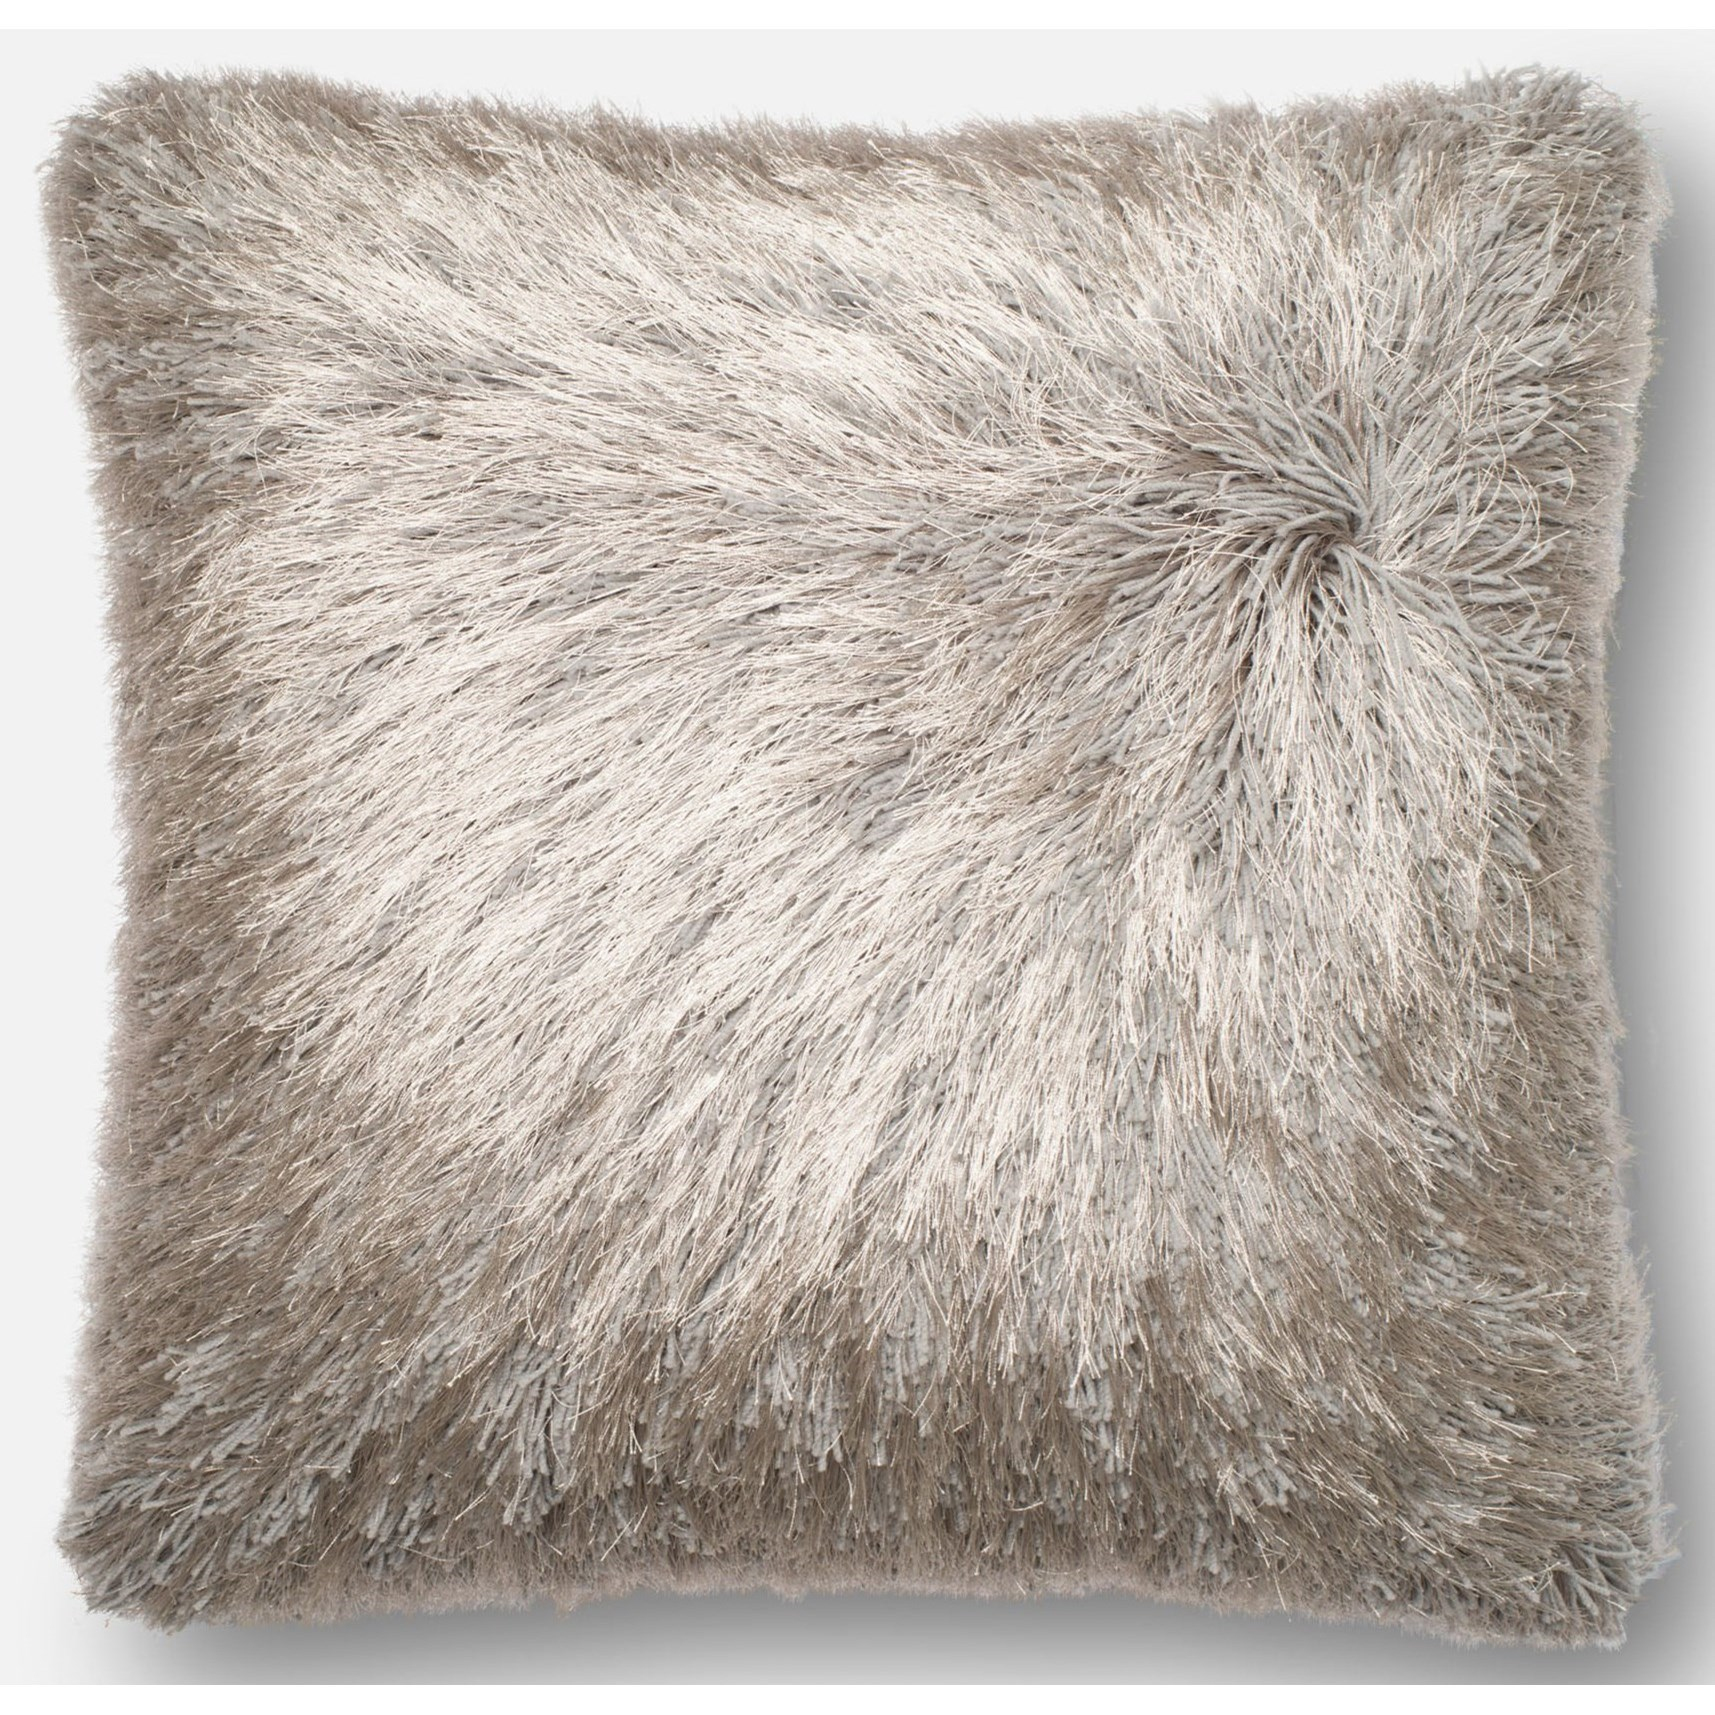 "Shag 22"" X 22"" Down Pillow by Loloi Rugs at Sprintz Furniture"